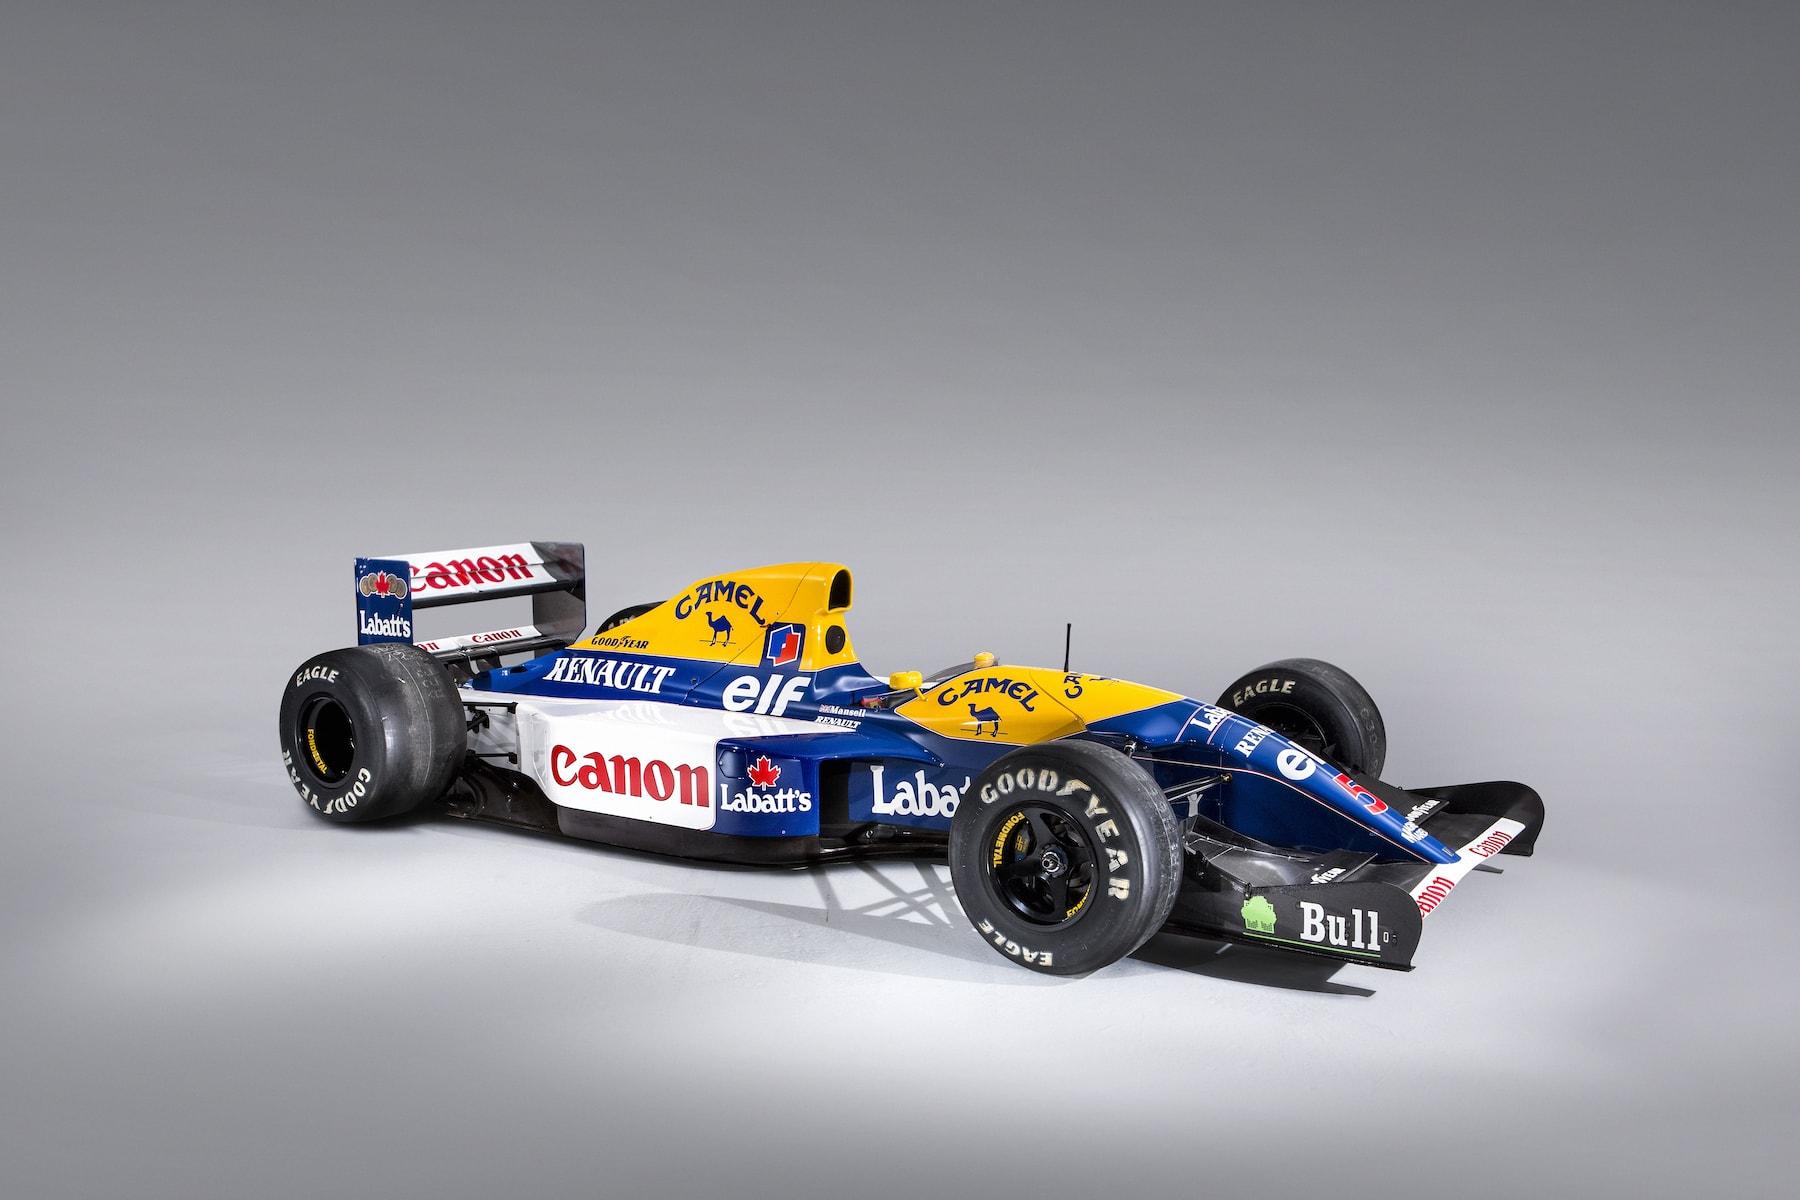 1992 Williams FW14B at Bonhams 2019 FoS 2 copy.jpg